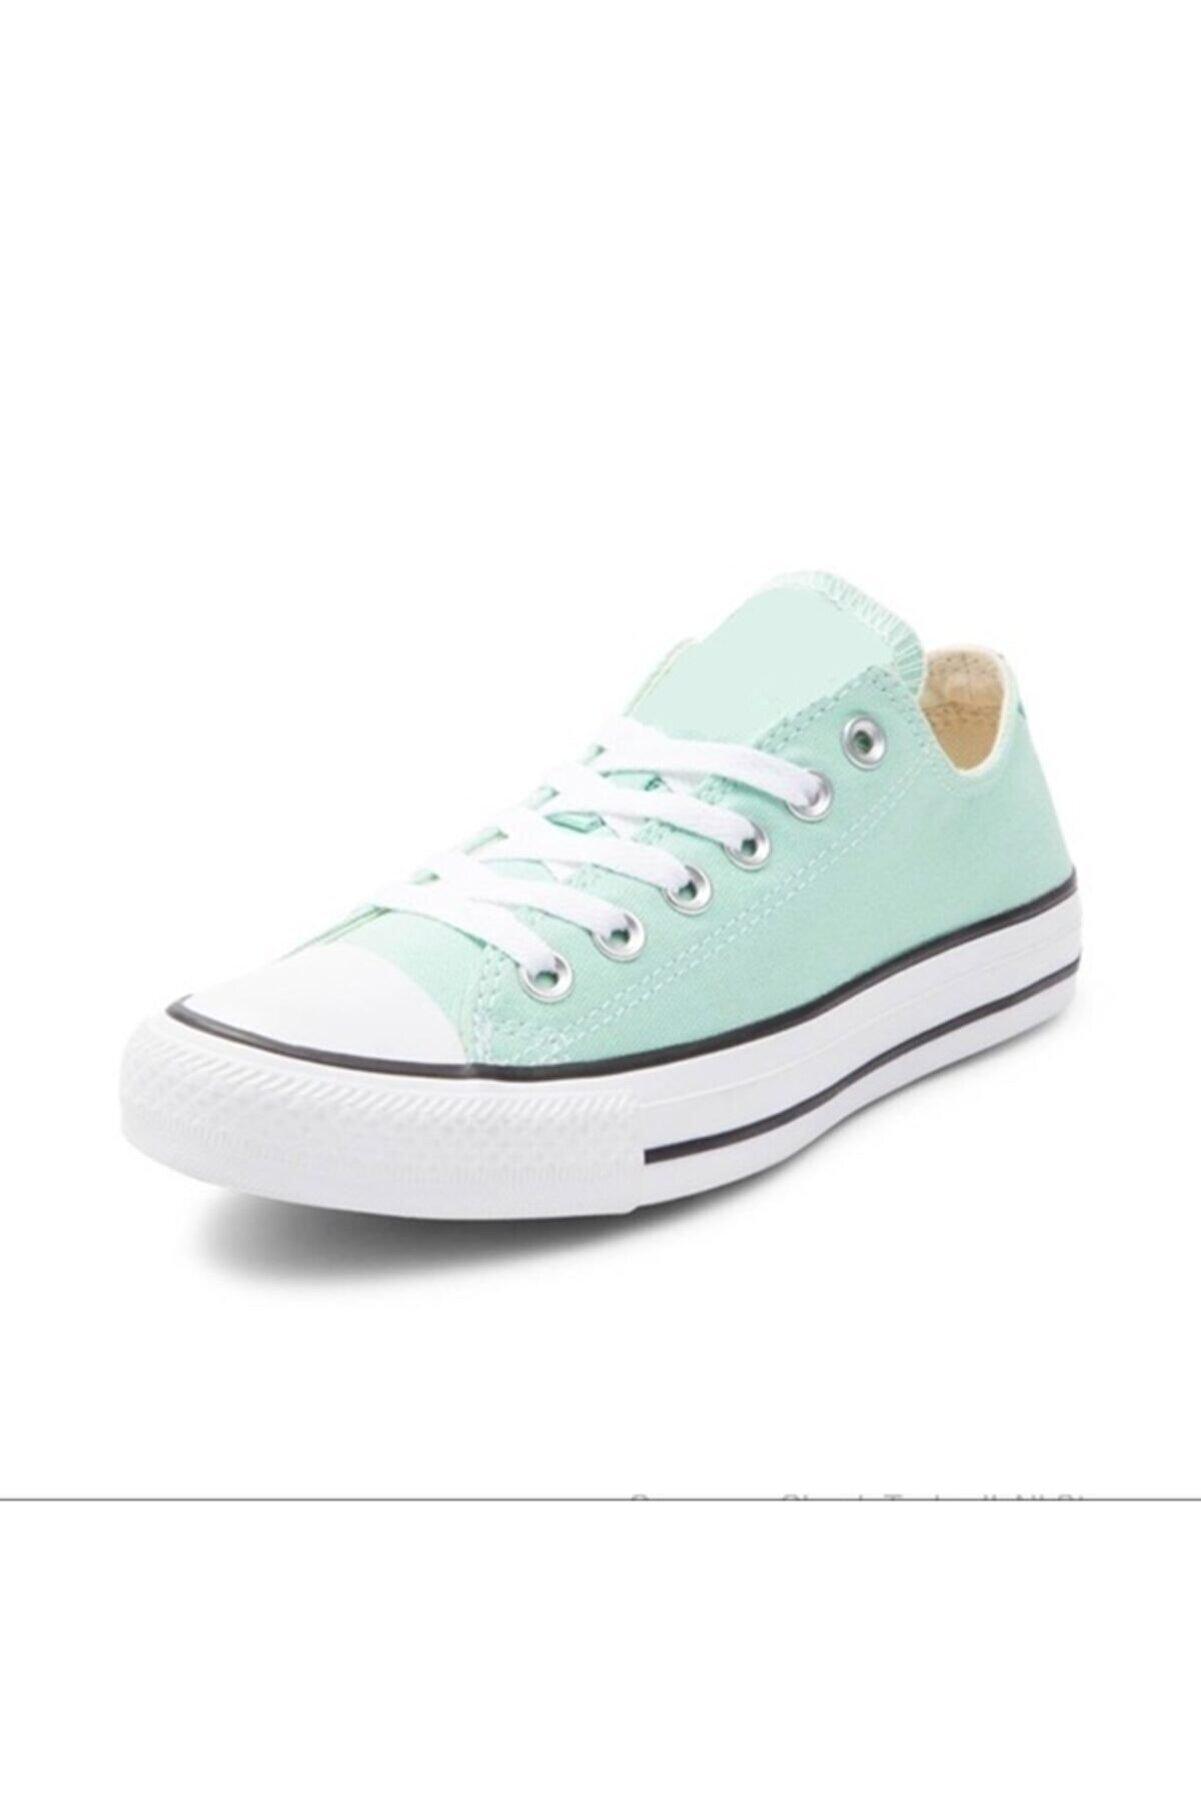 Odal Shoes Unisex Mint Yeşili Ortopedik Şeritli Sneakers